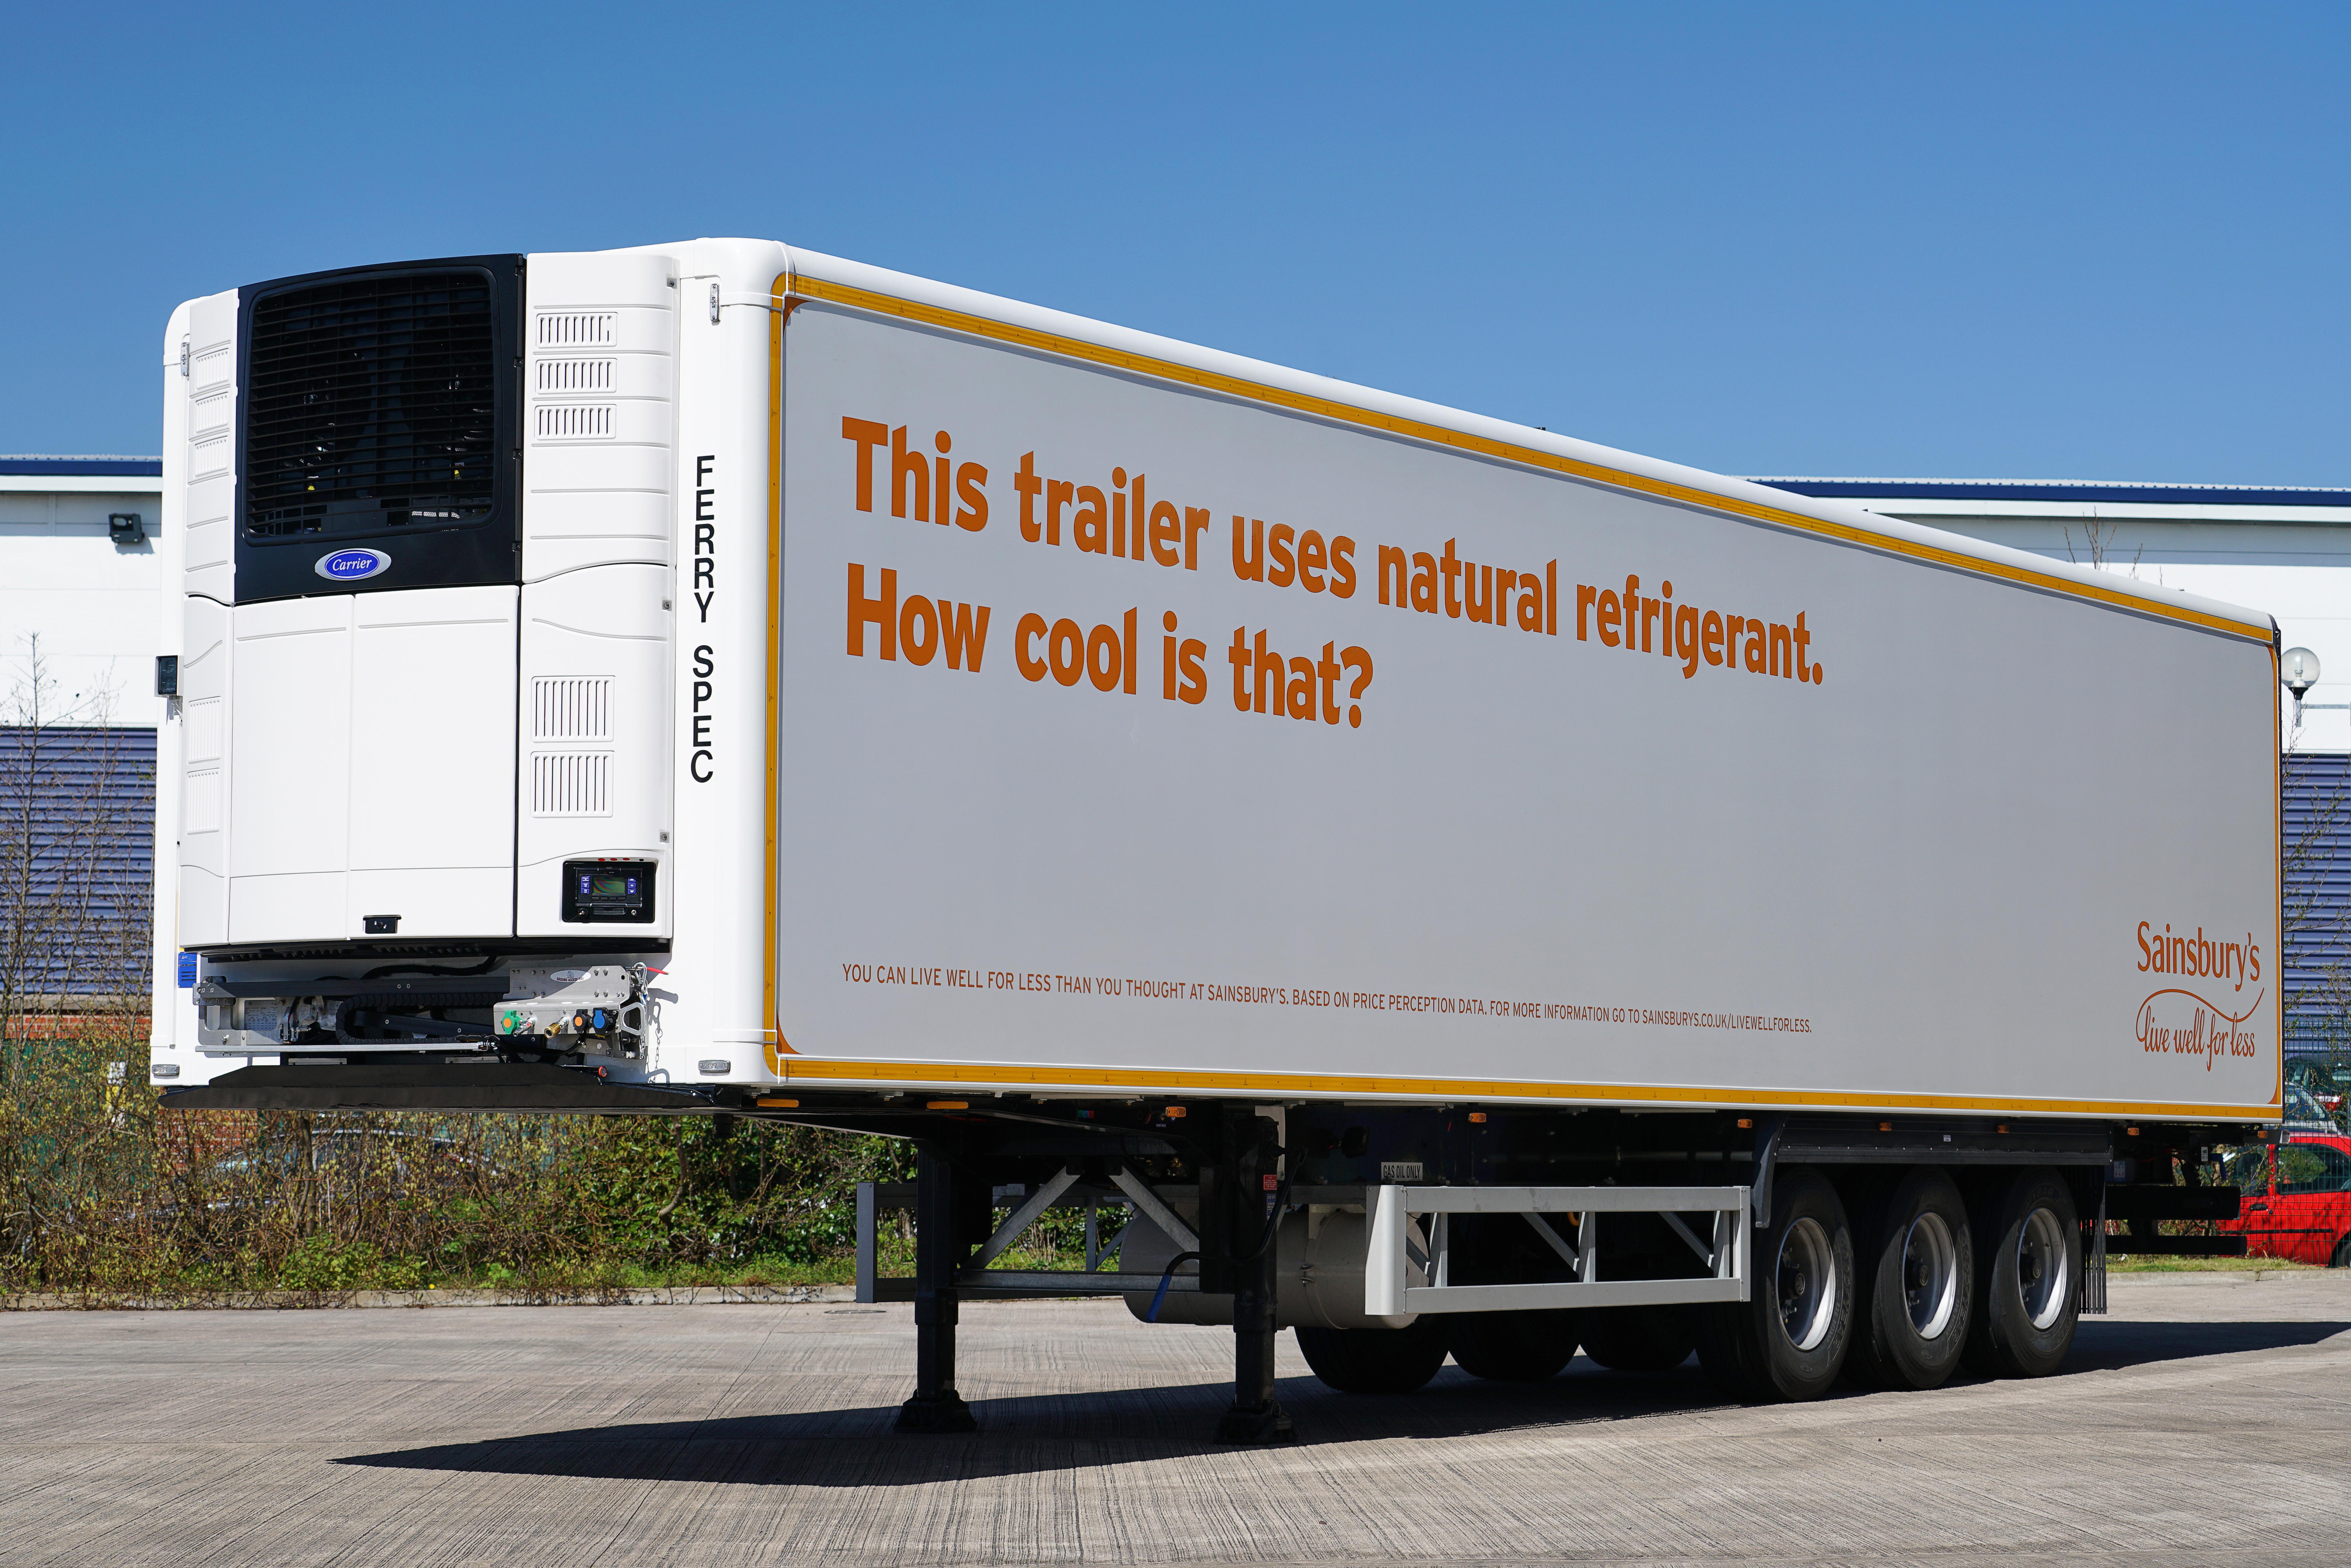 207-280-Carrier-Transicold-Sainsburys-natural-refigerant